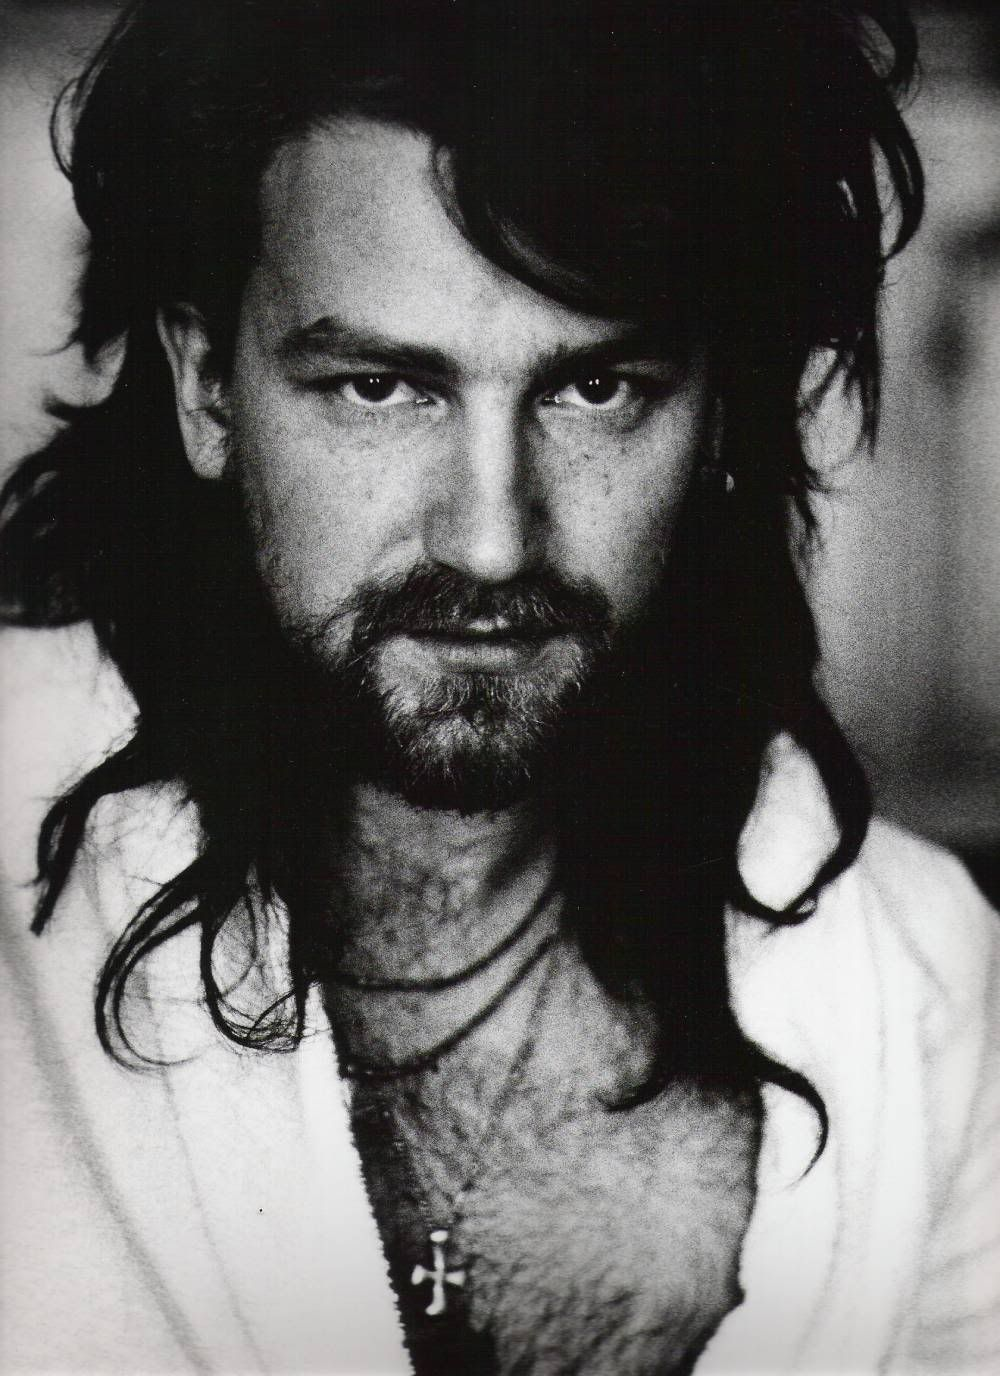 young Bono by Anton Corbijn